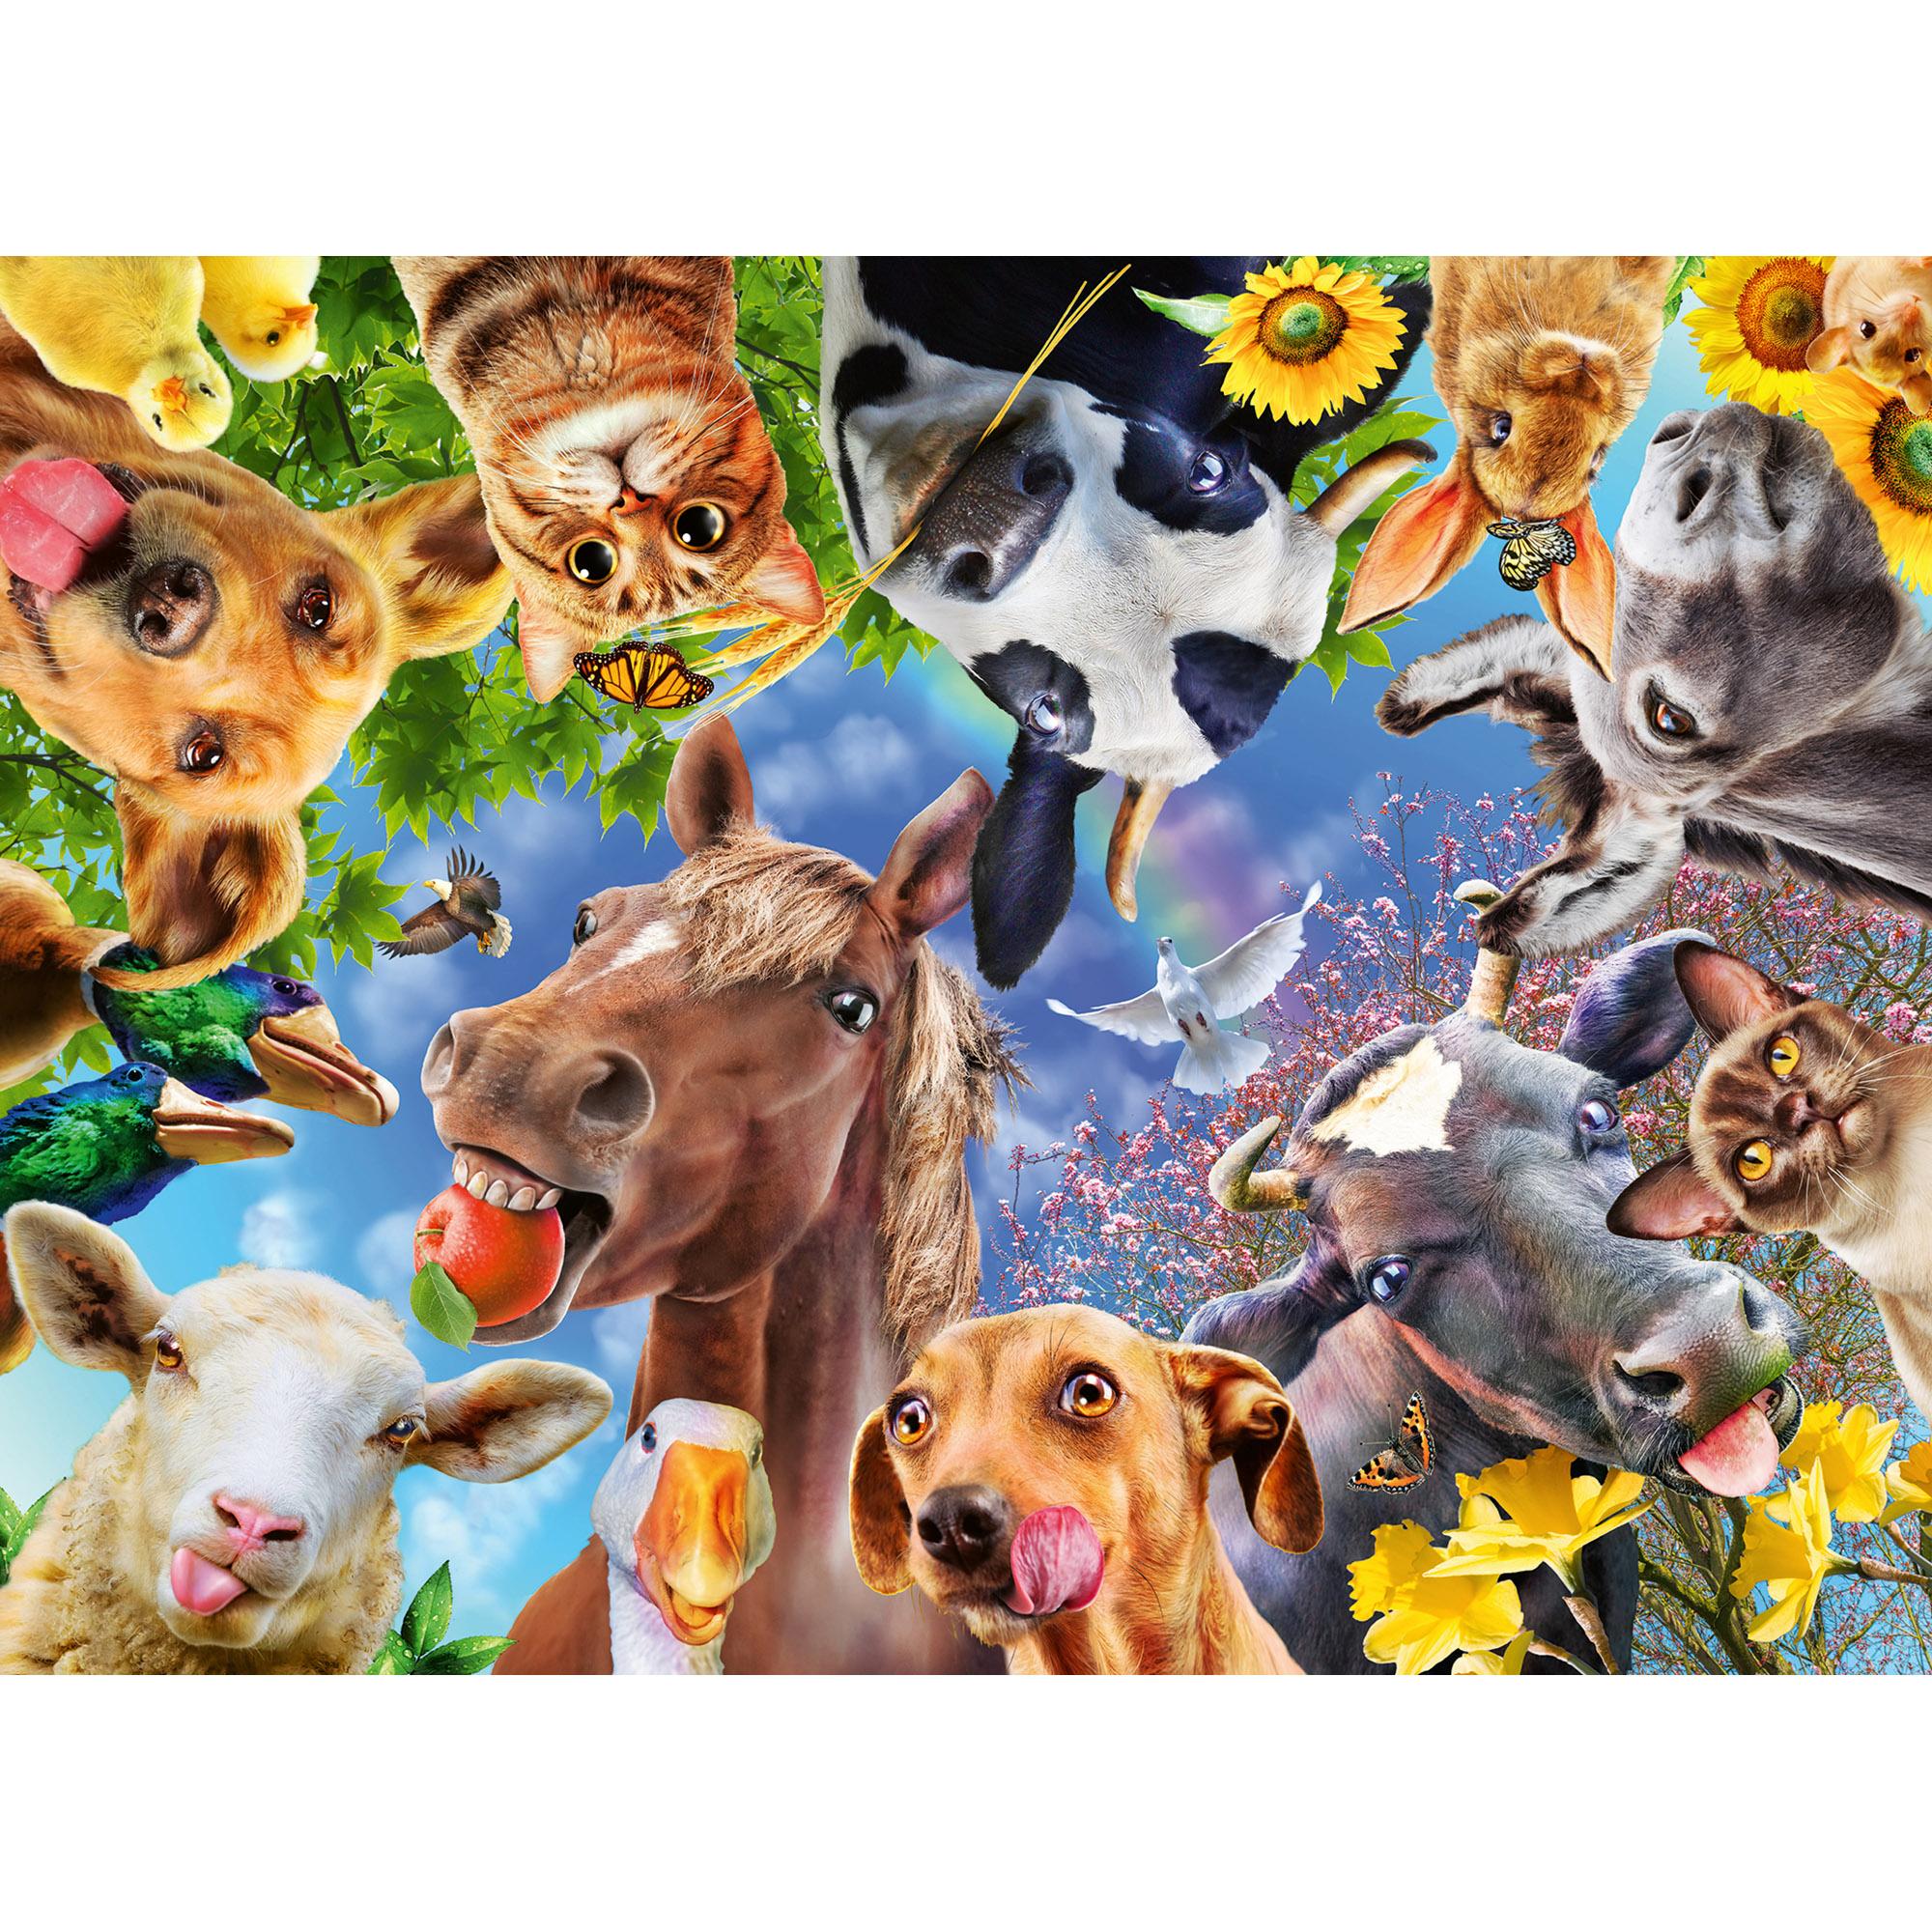 Puzzle portret cu animale 200 piese ravensburger - 1